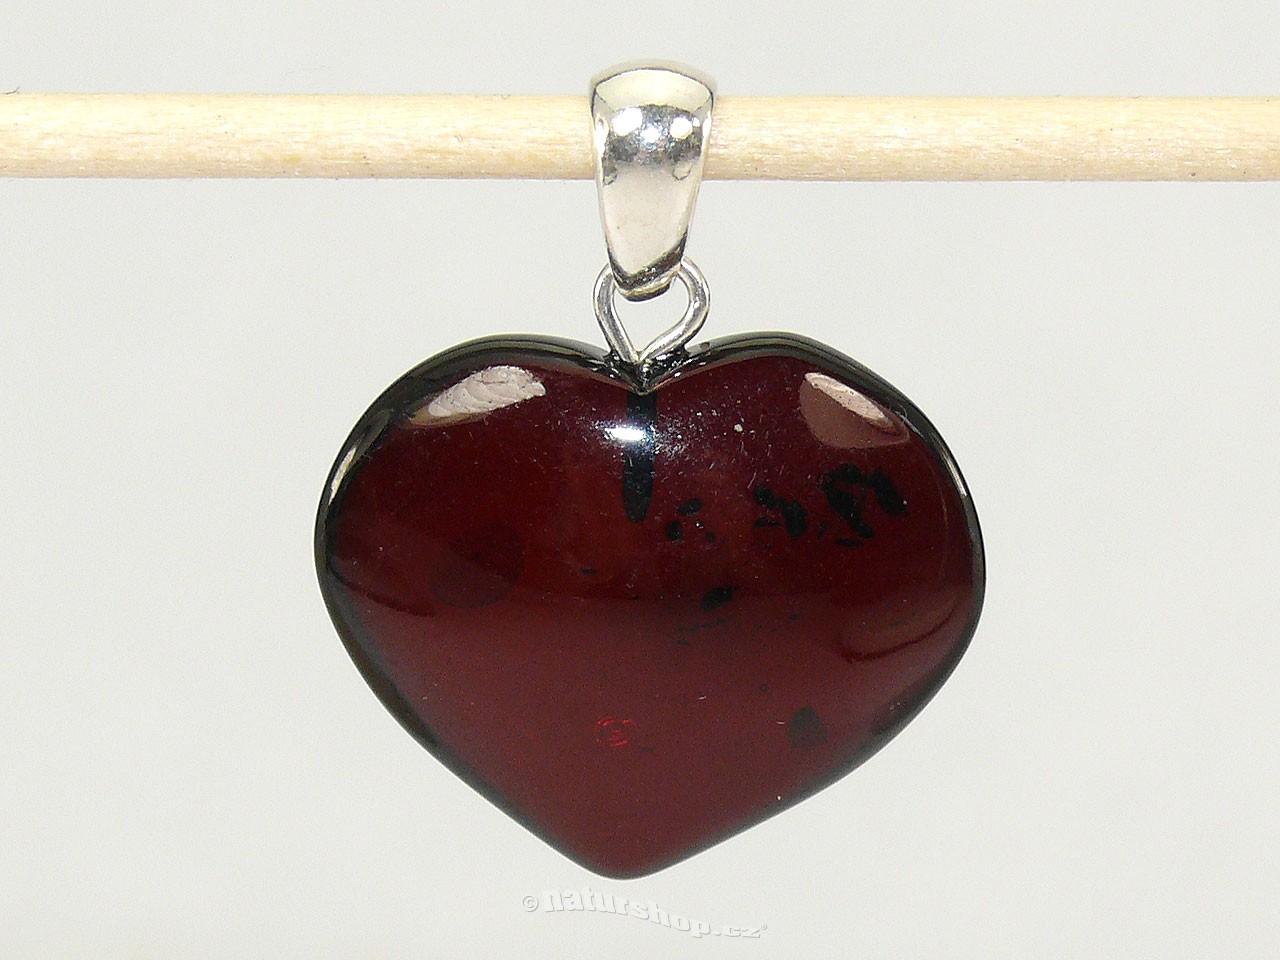 Přívěsek jantar tmavé srdce stříbrný úchyt 2,0g